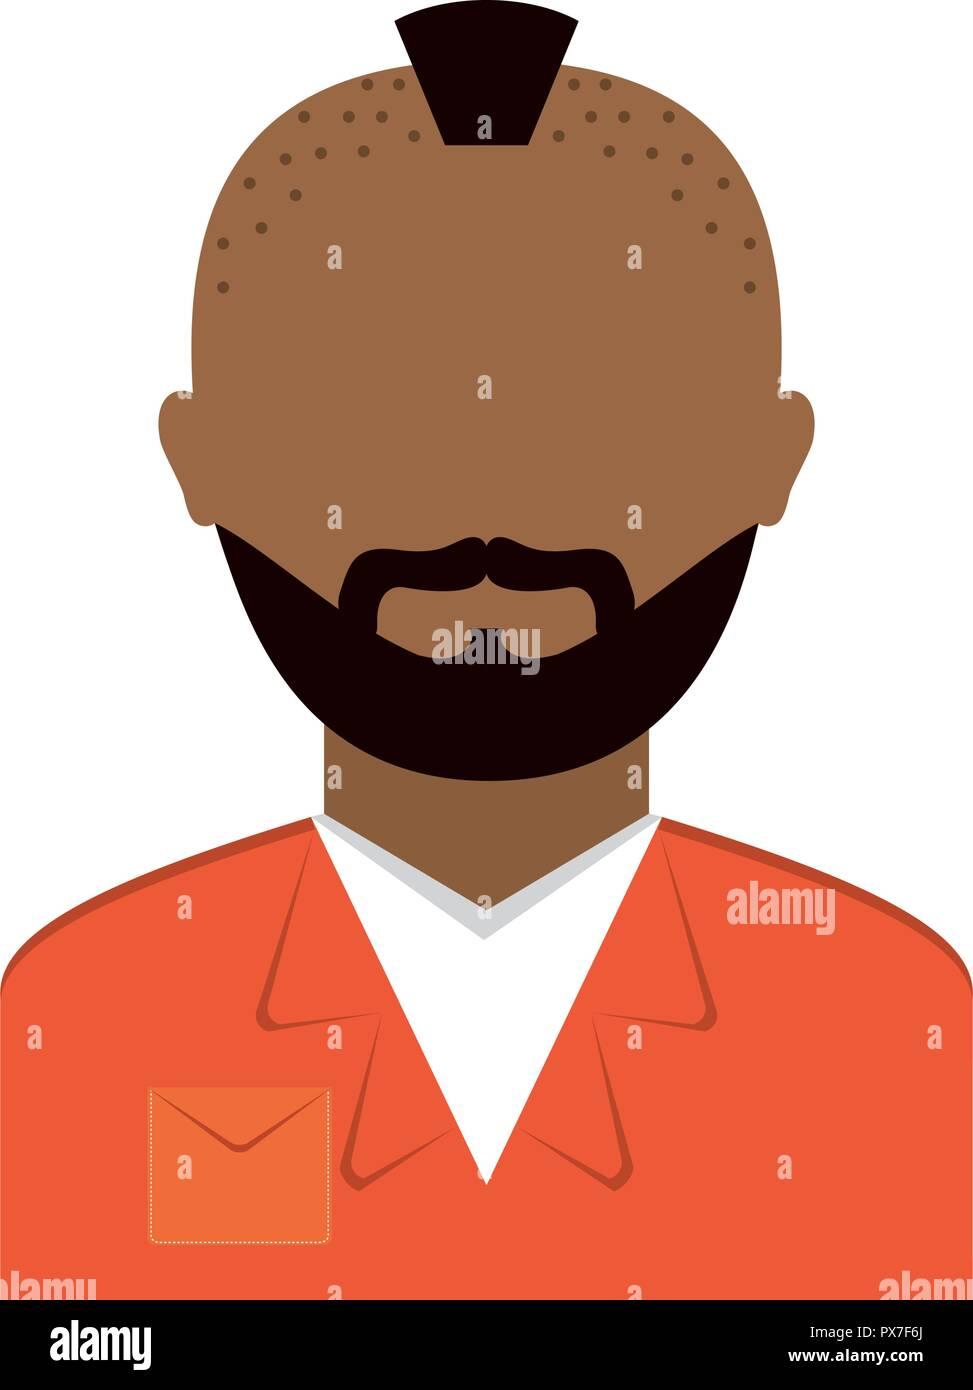 danger bandit avatar character vector illustration design - Stock Image